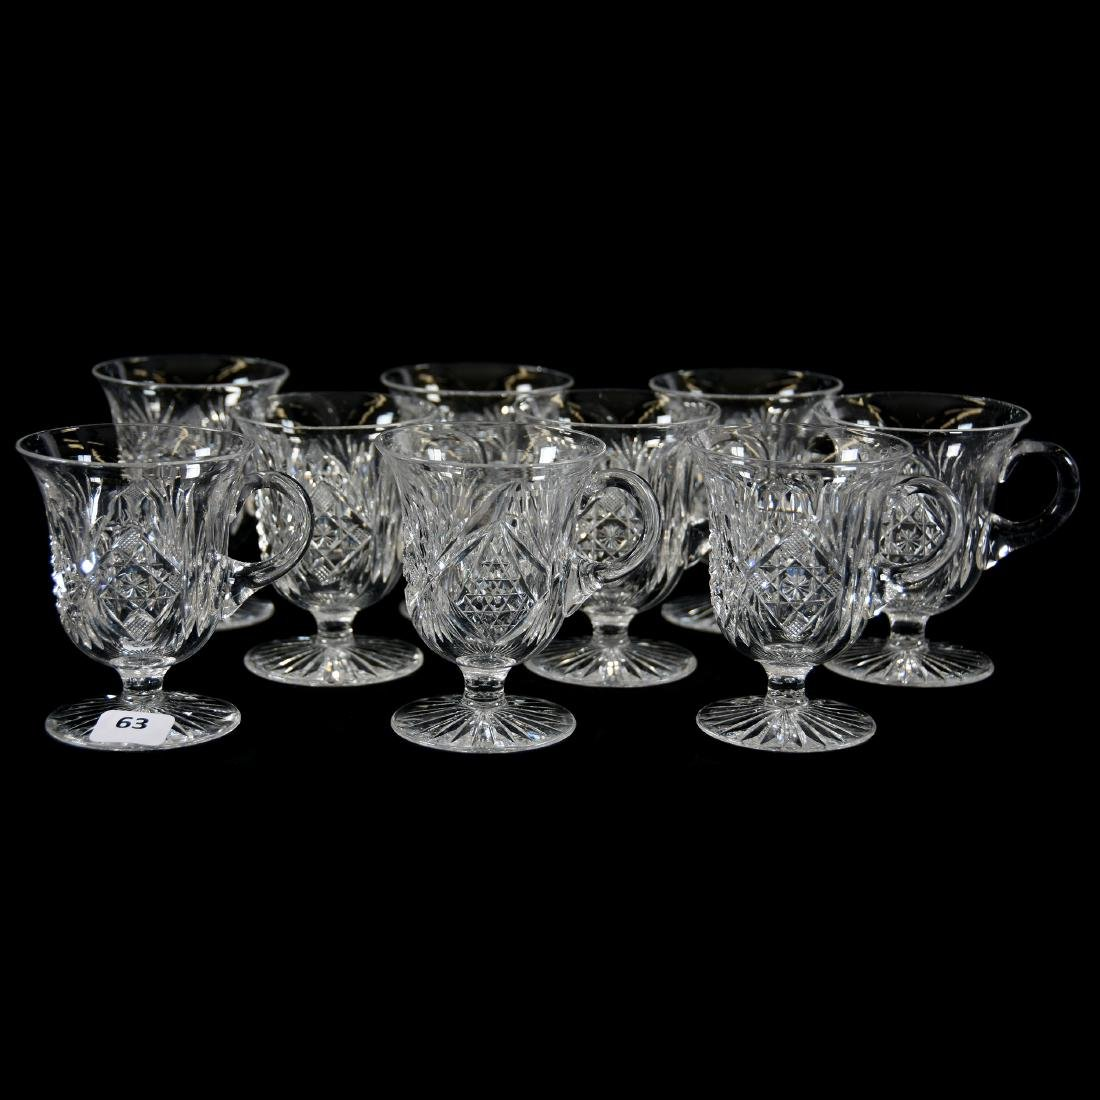 (9) Punch Cups, Hobstar, Nailhead Diamond & Fan Motif